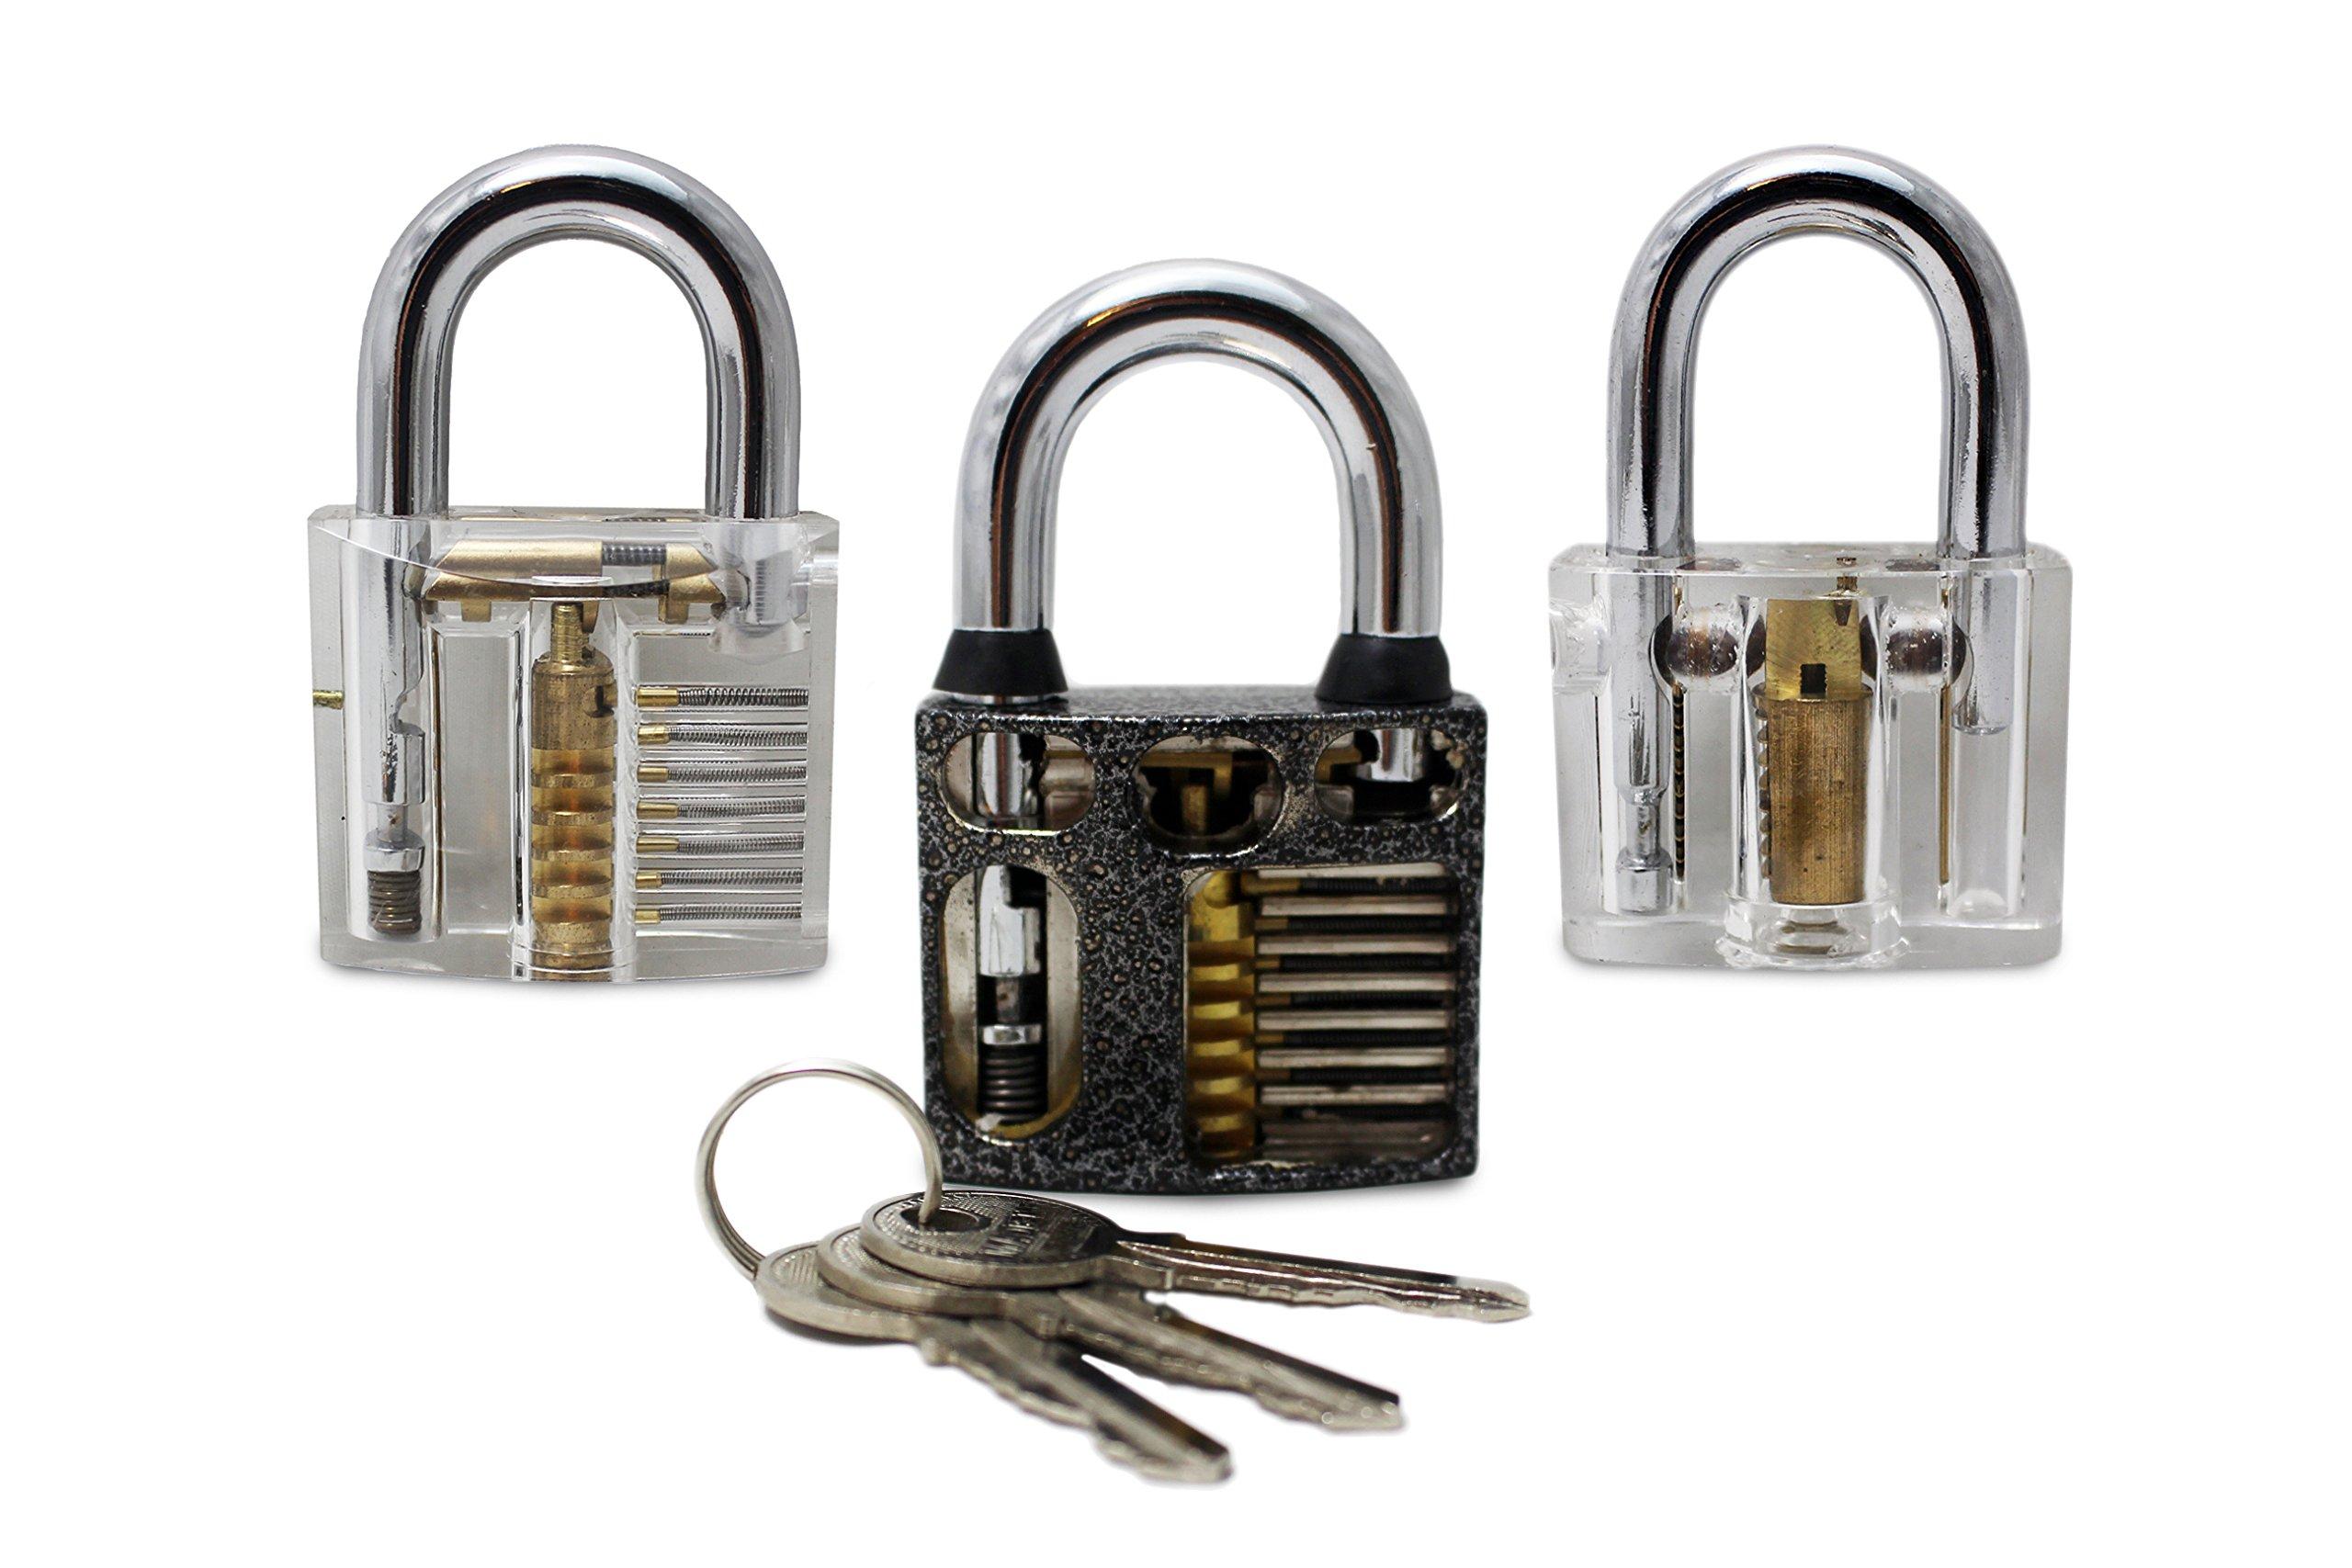 Step up 3pc Lock Set for Training Practice - Clear Transparent Cutaway Padlocks